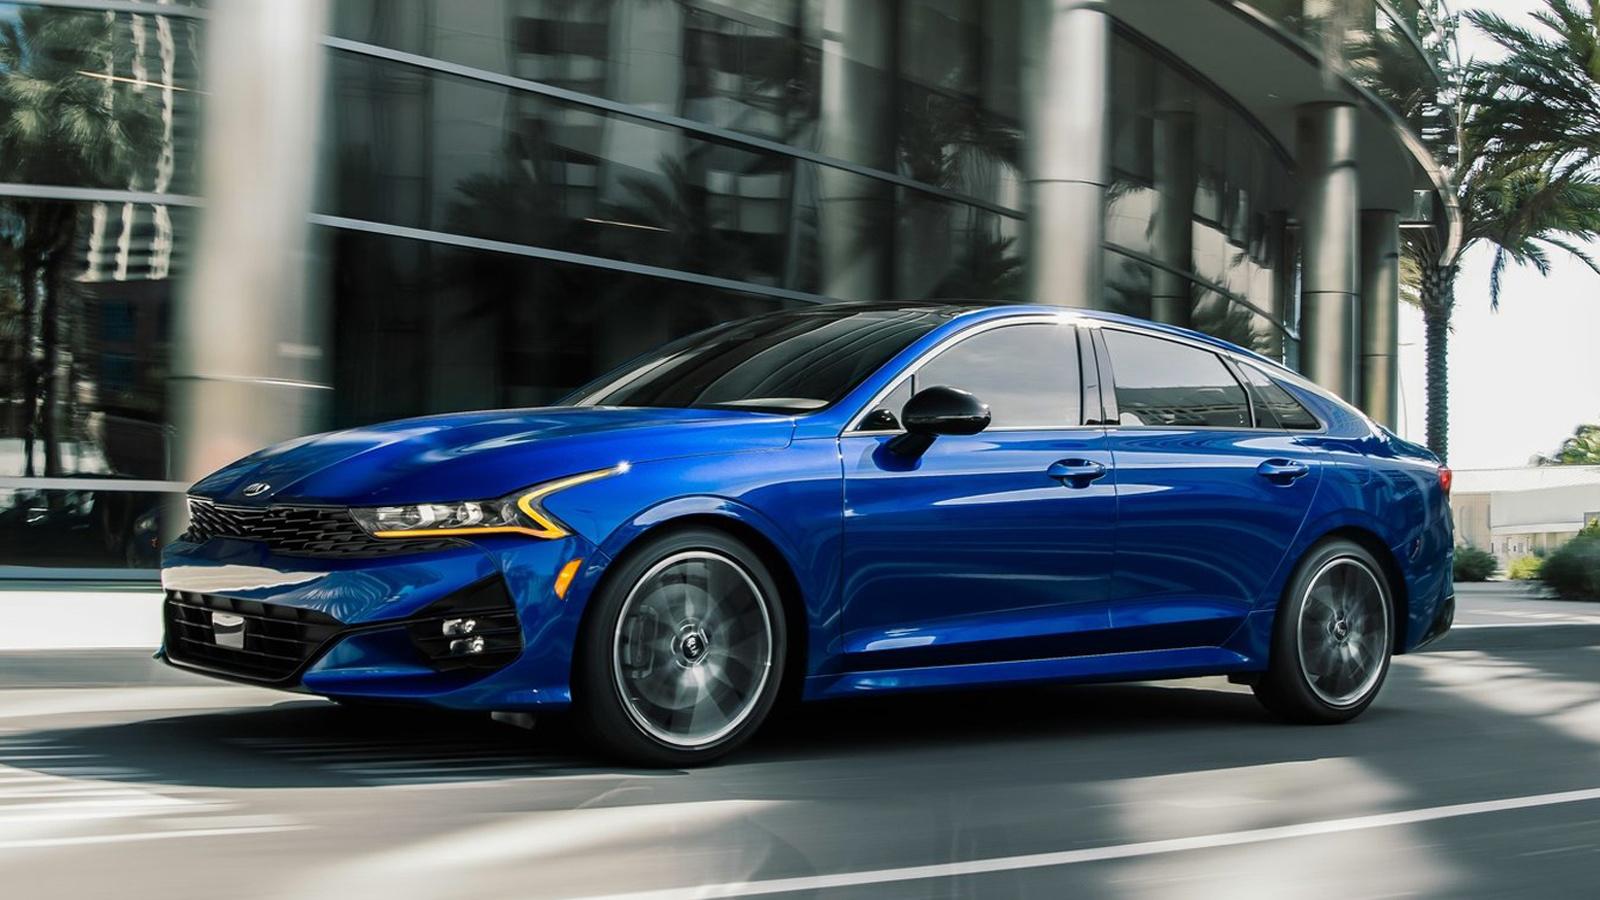 www.best-selling-cars.com